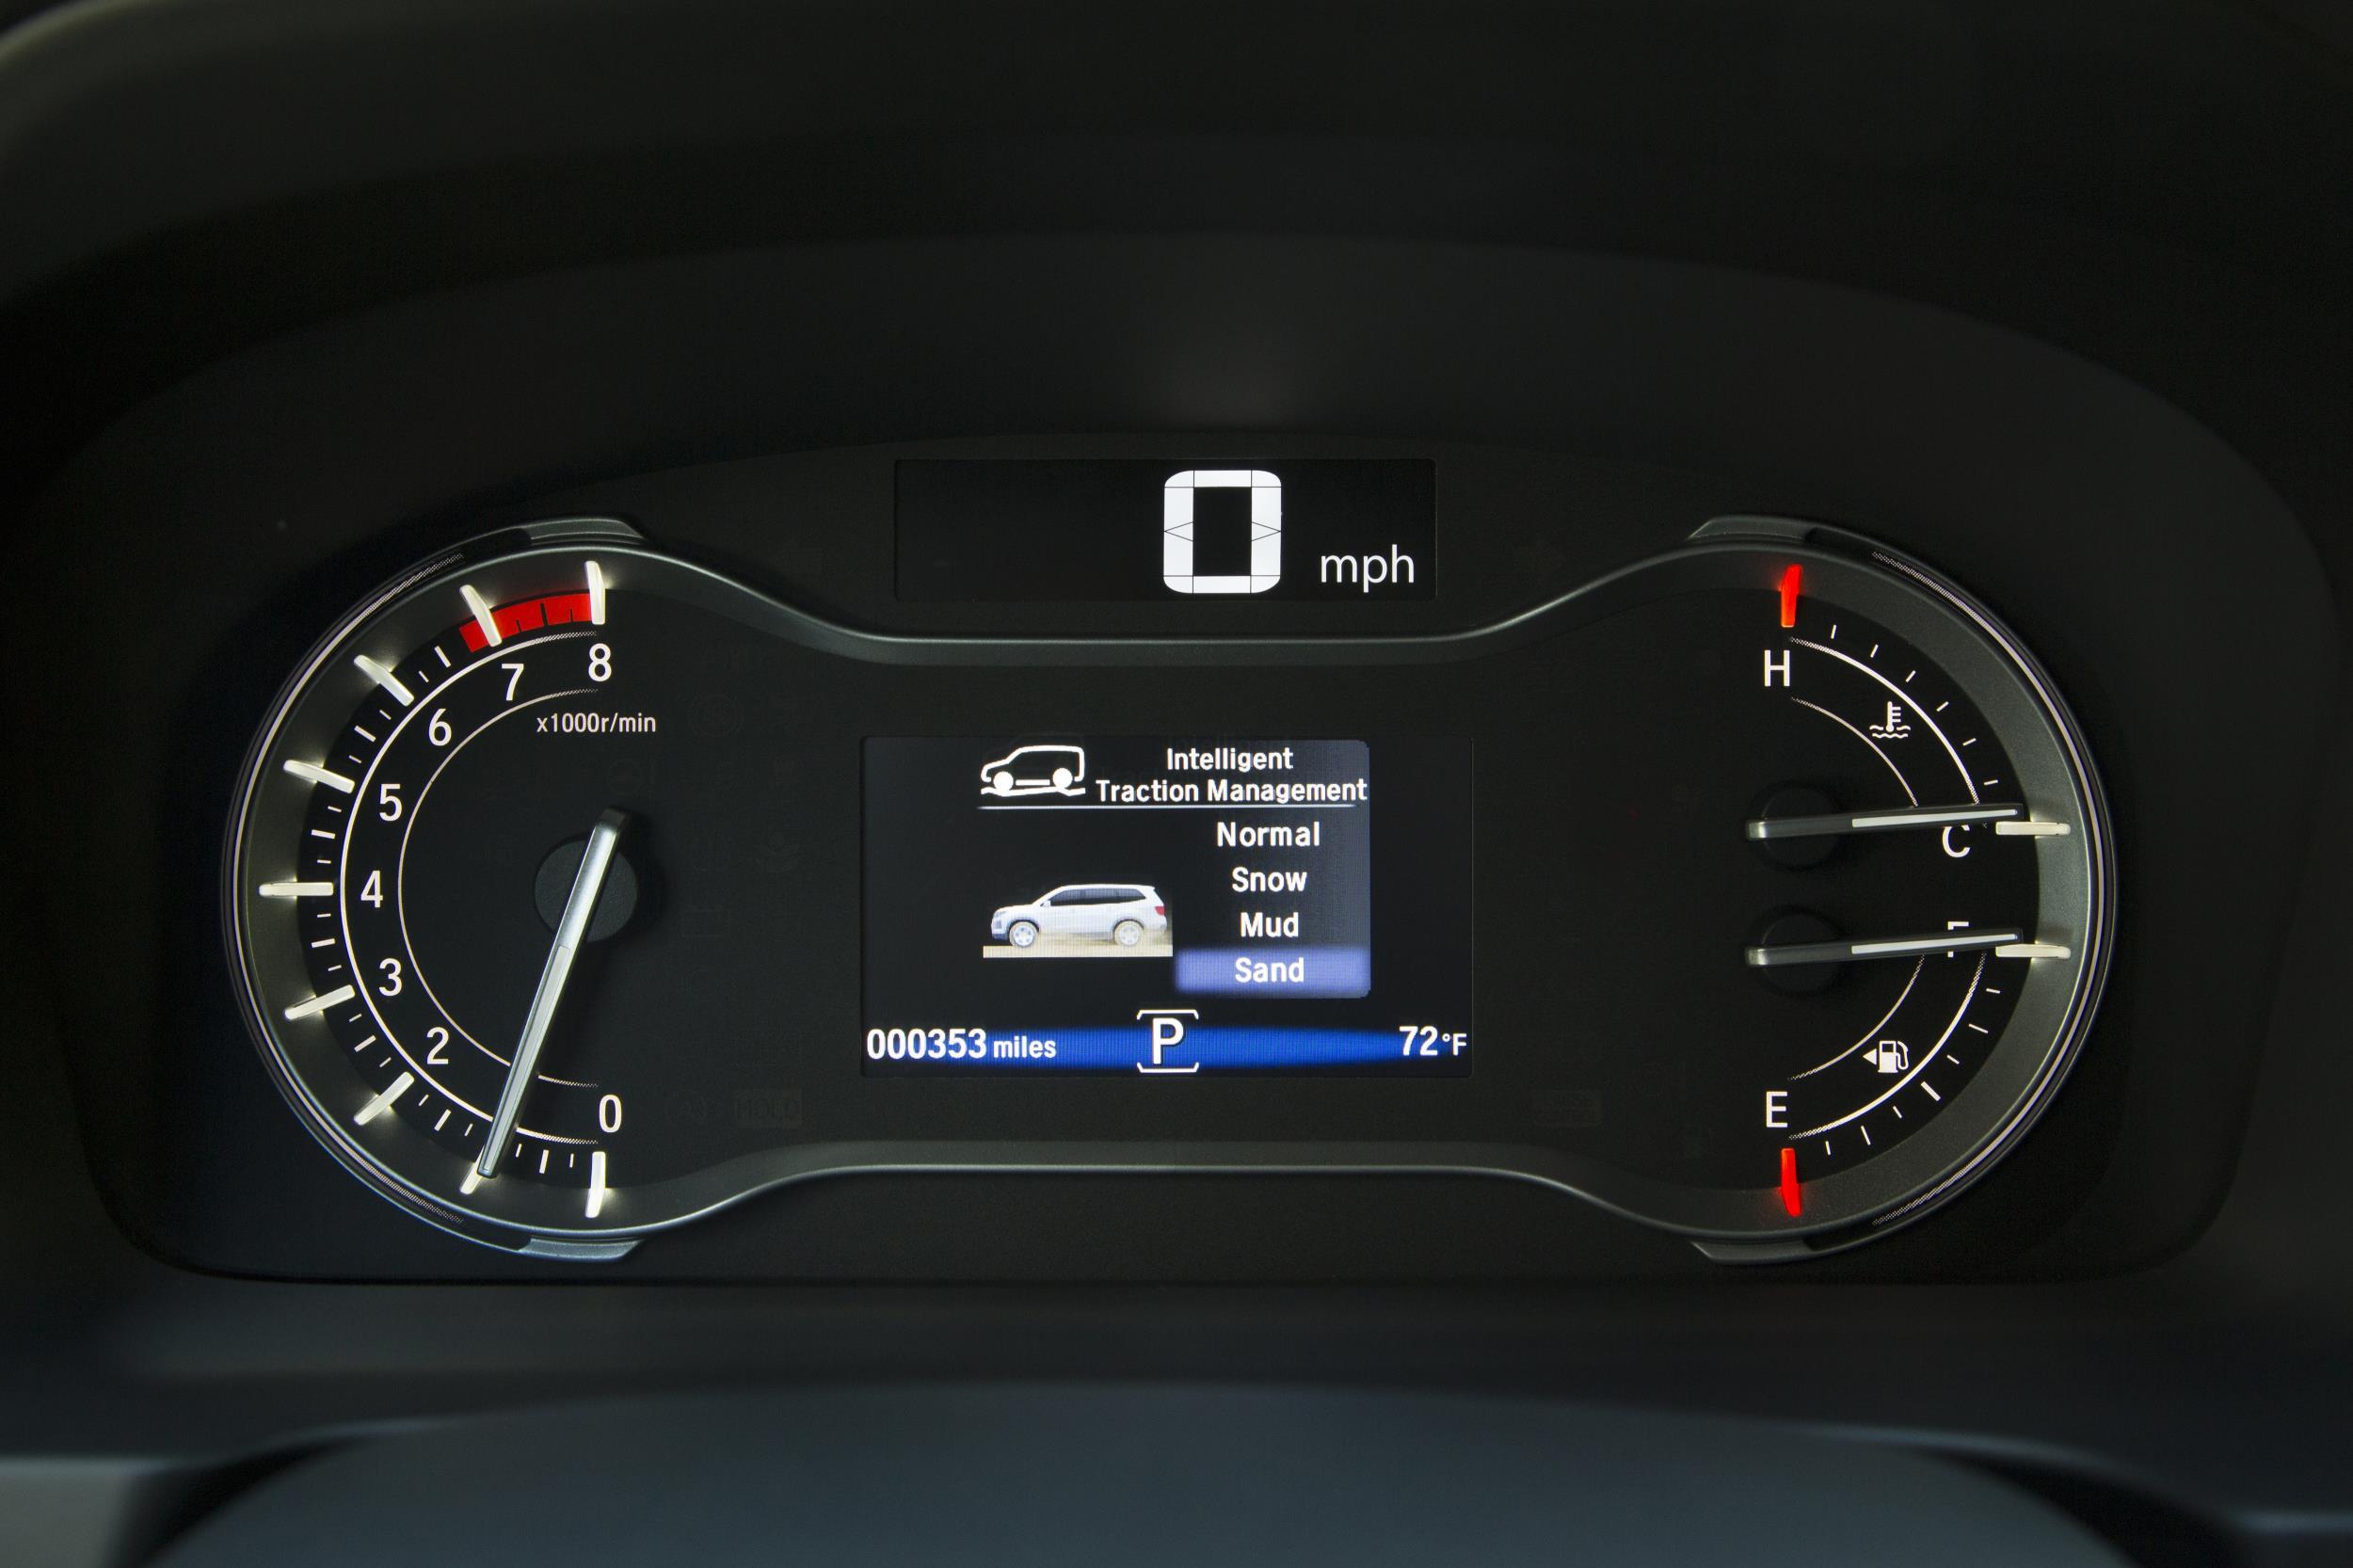 2017 Honda Pilot Adds Techy Goodies, New Interior Trim - autoevolution